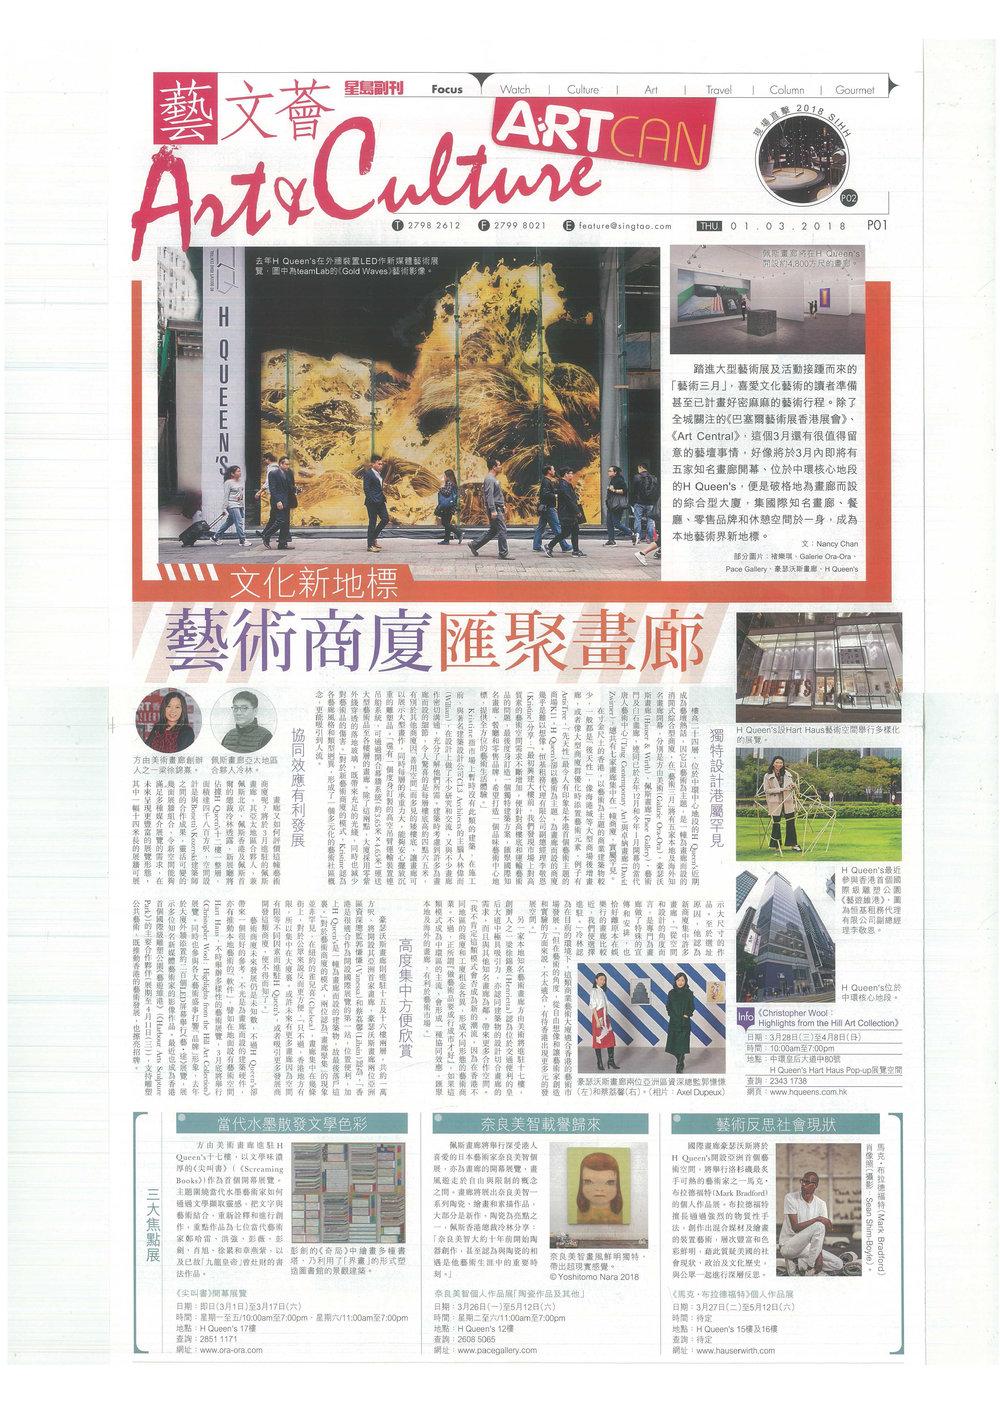 03_180301 Sing Tao Daily_Art & Culture-1.jpg